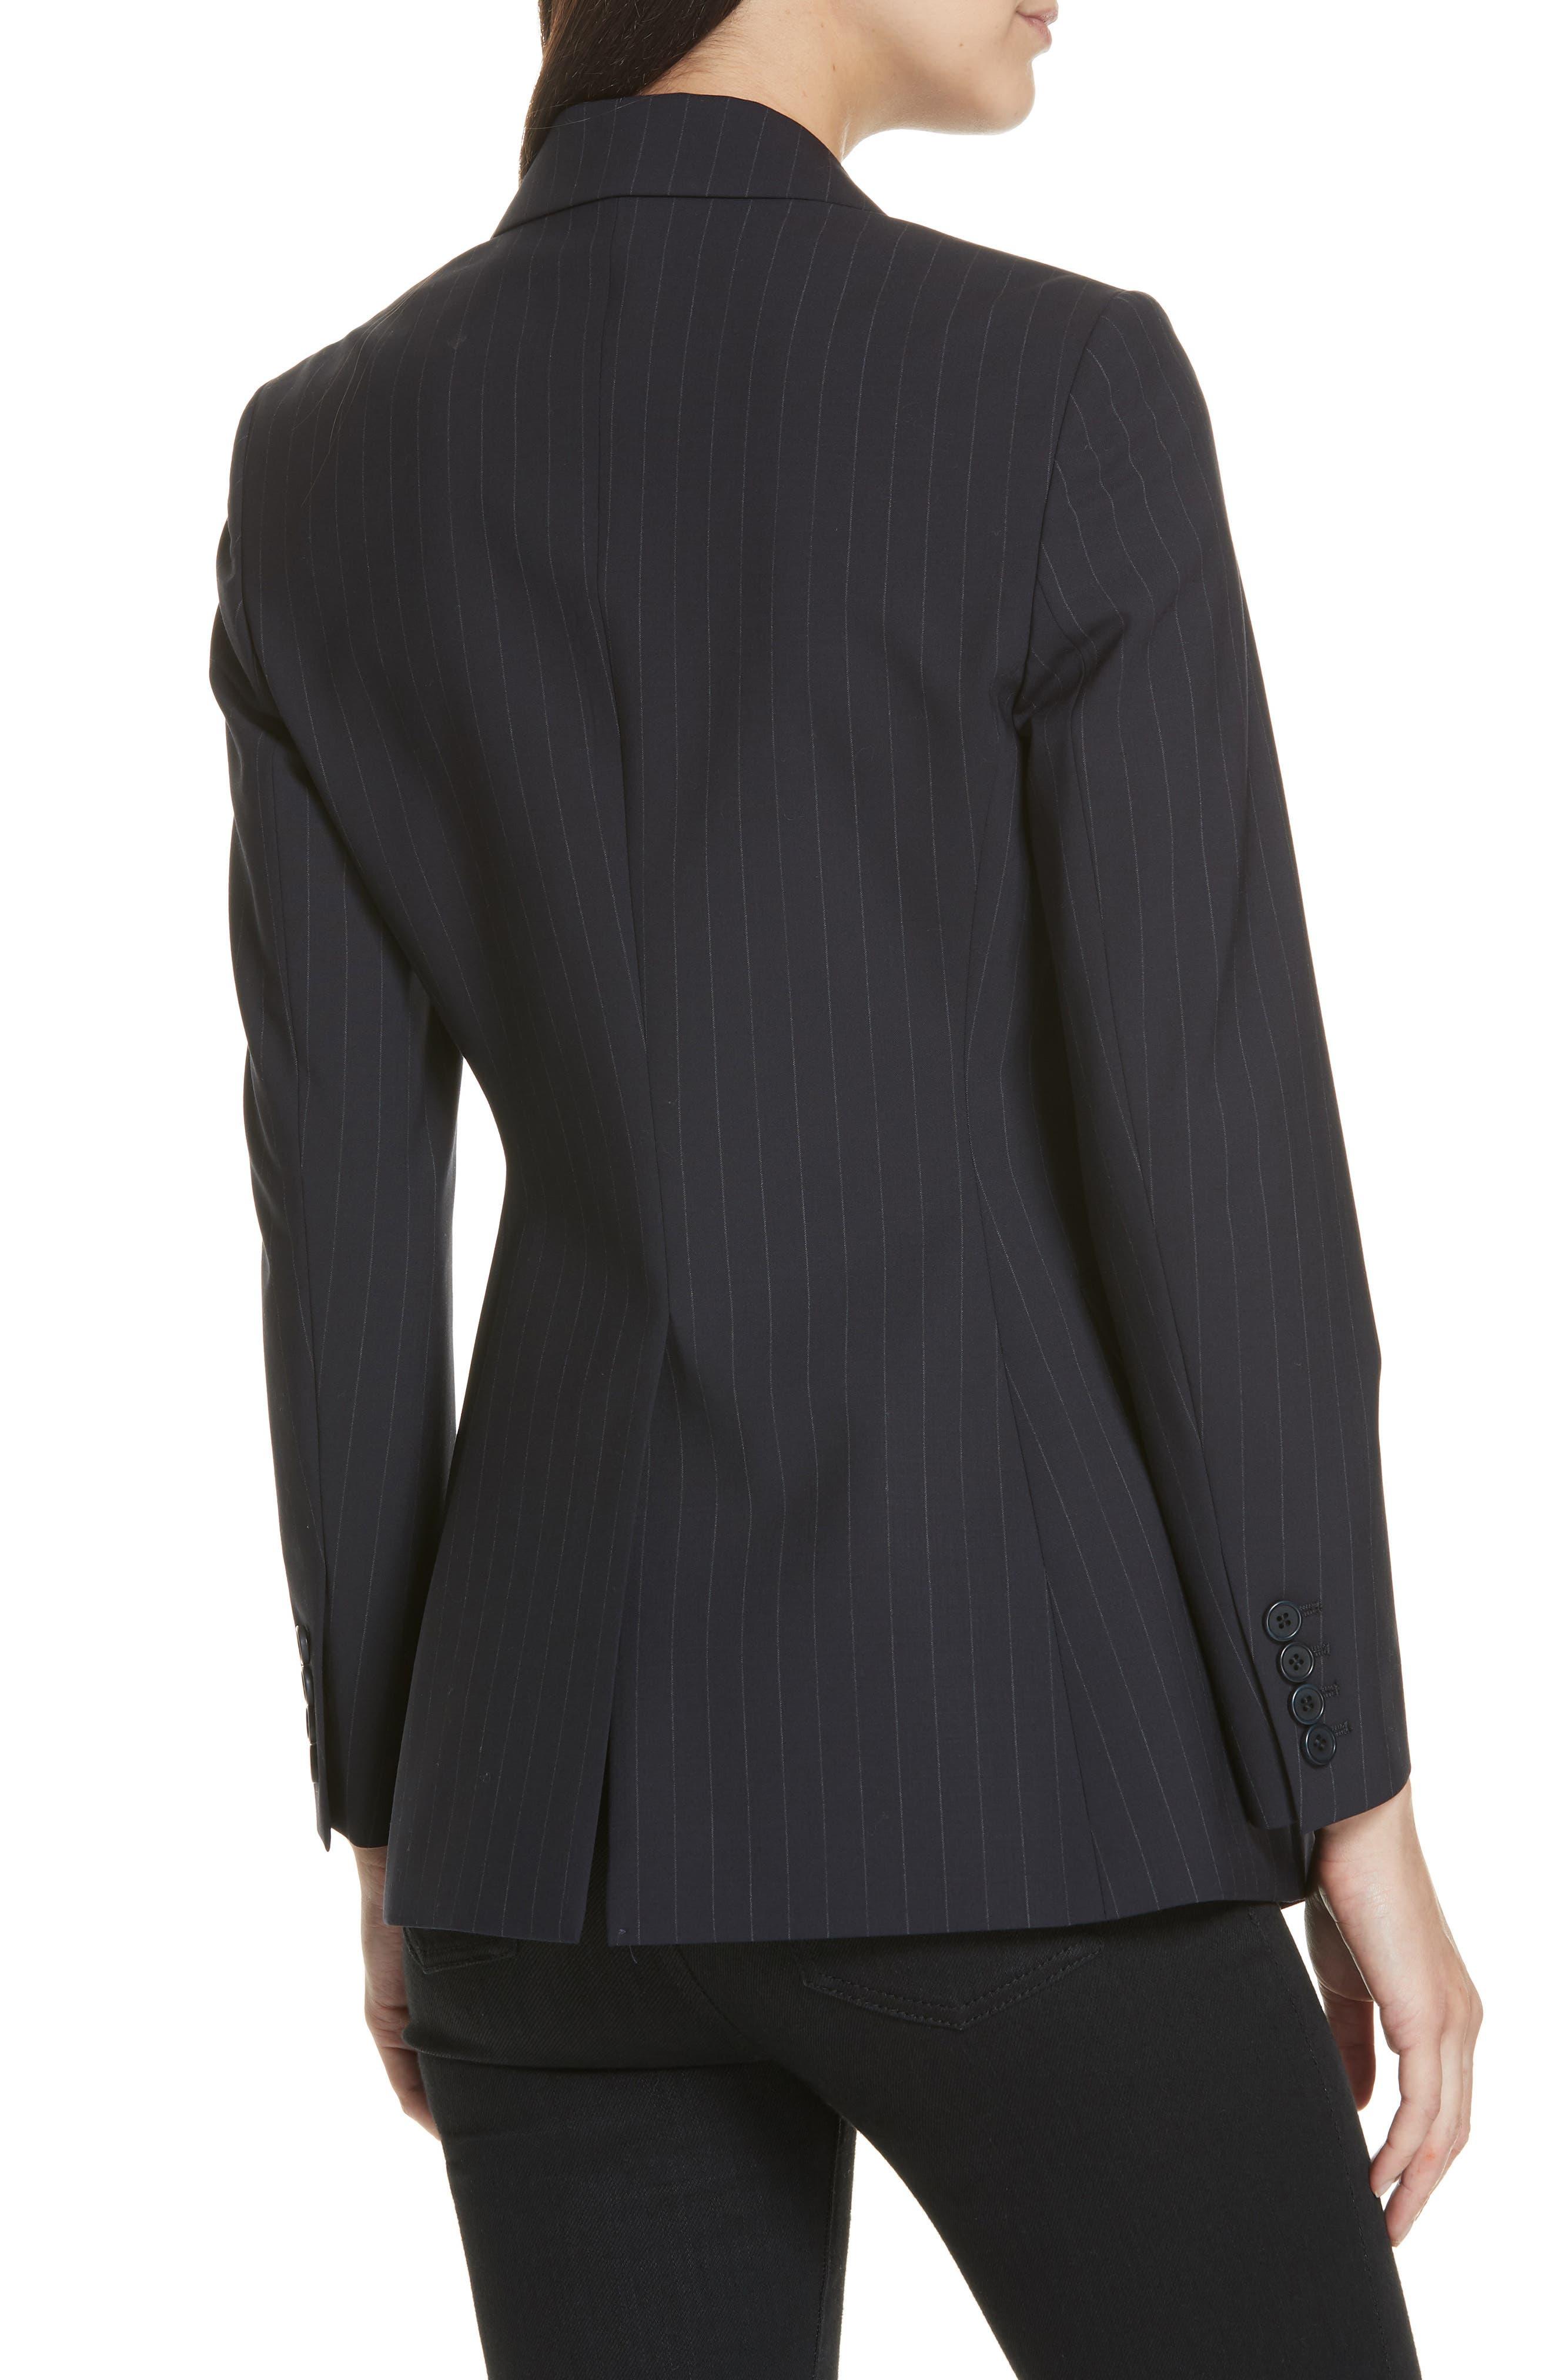 Etienette B Good Wool Suit Jacket,                             Alternate thumbnail 11, color,